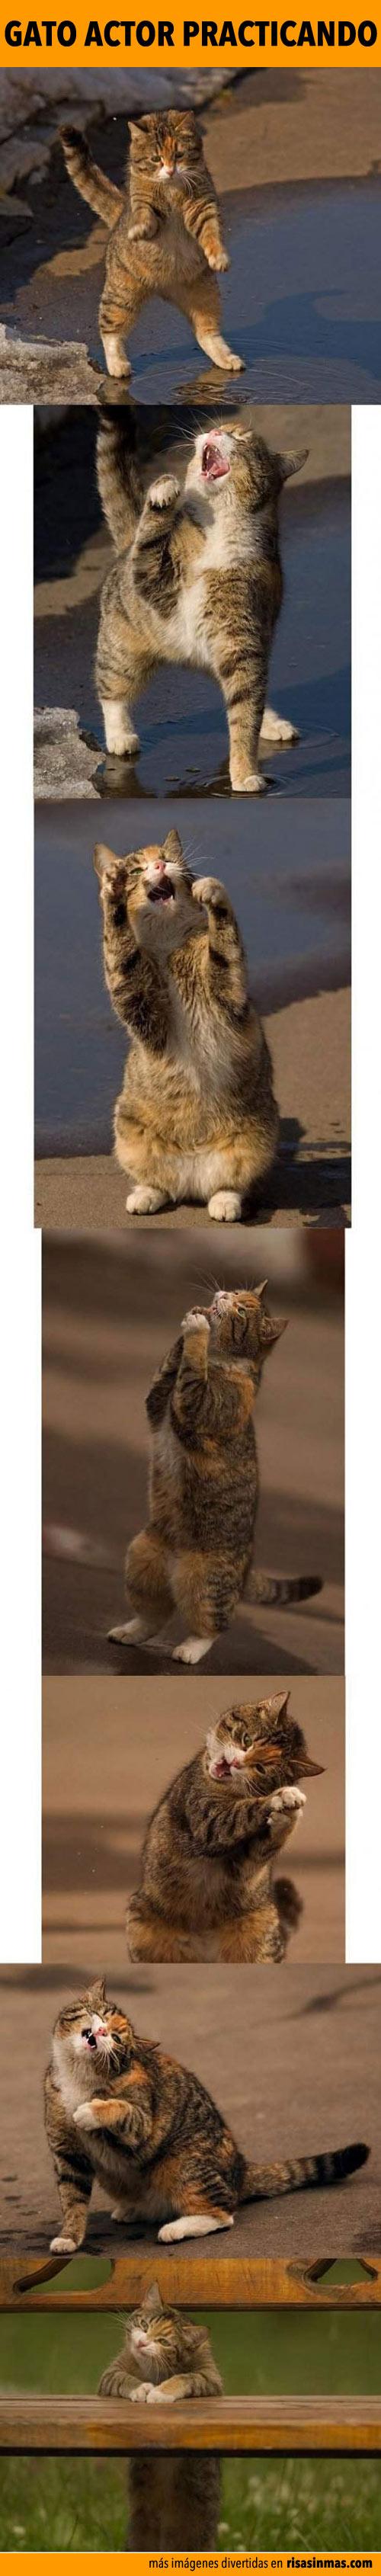 Gato actor practicando